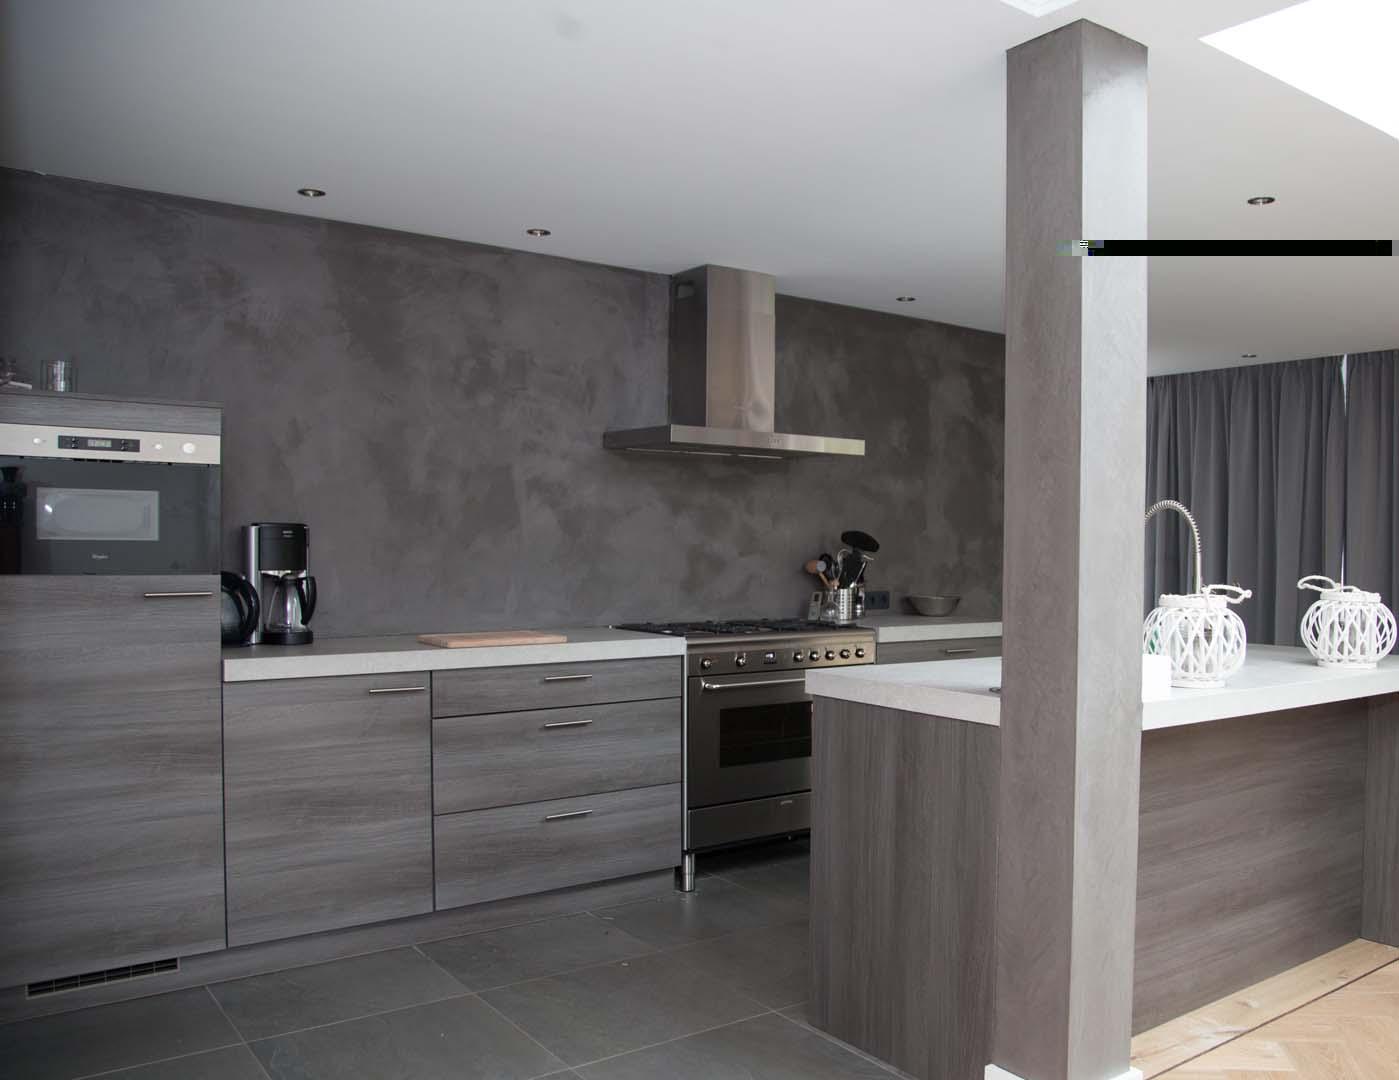 Van der looy betonlook achterwand - Keuken uitgerust m ...